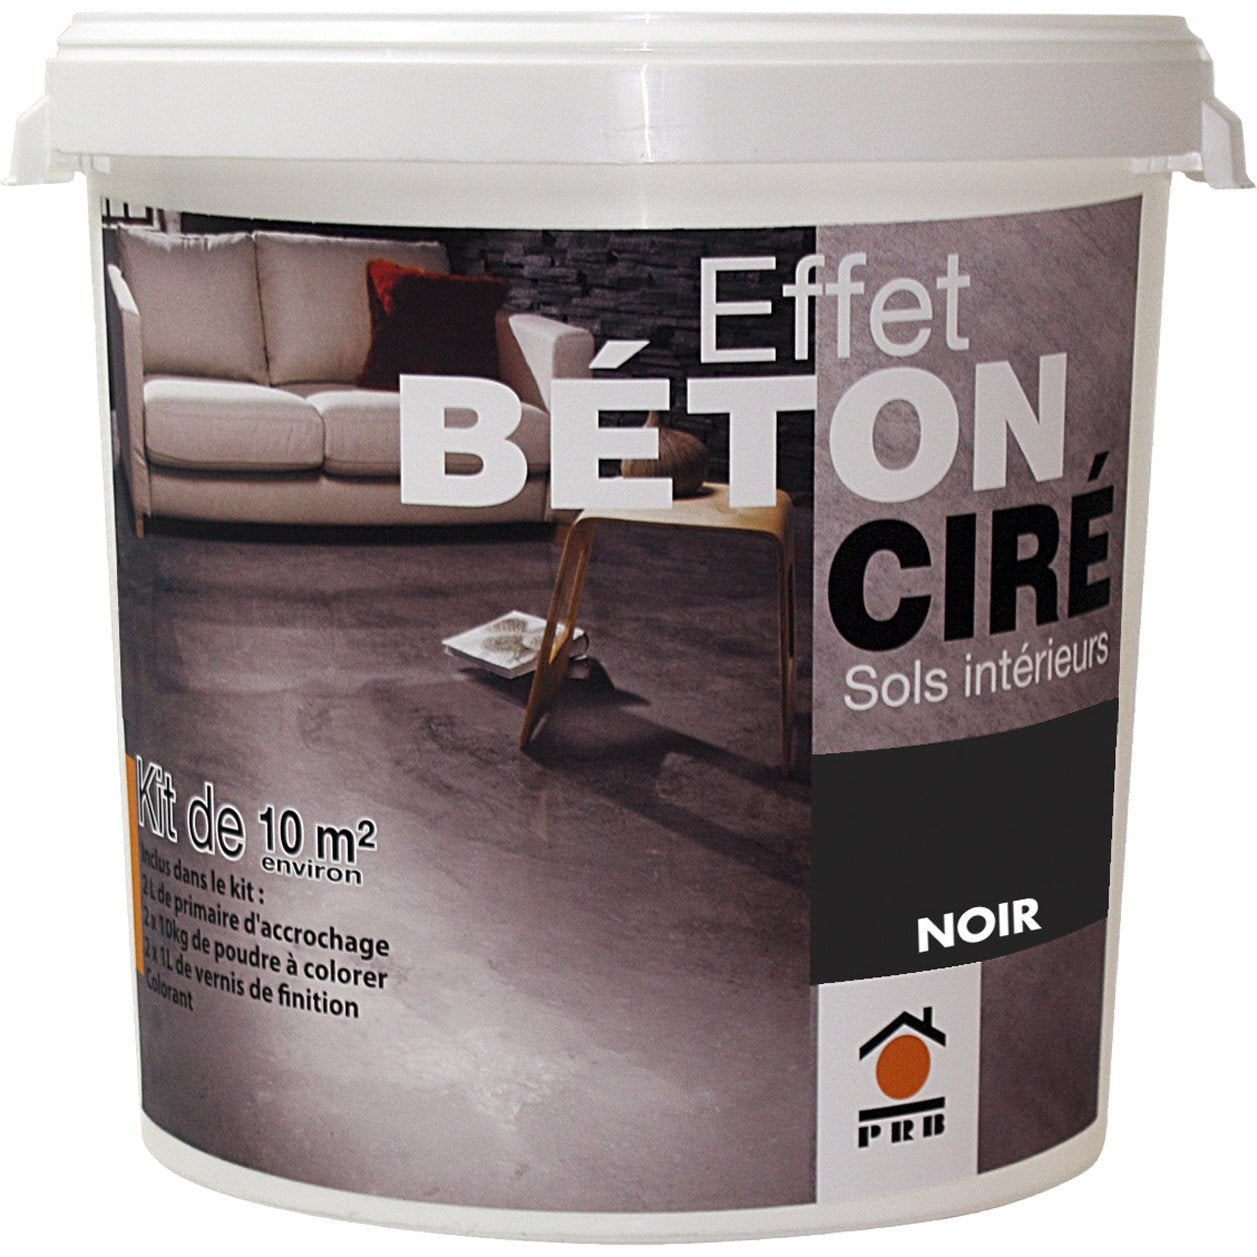 B ton effet cir ivoire prb 10m leroy merlin - Beton decoratif exterieur leroy merlin ...